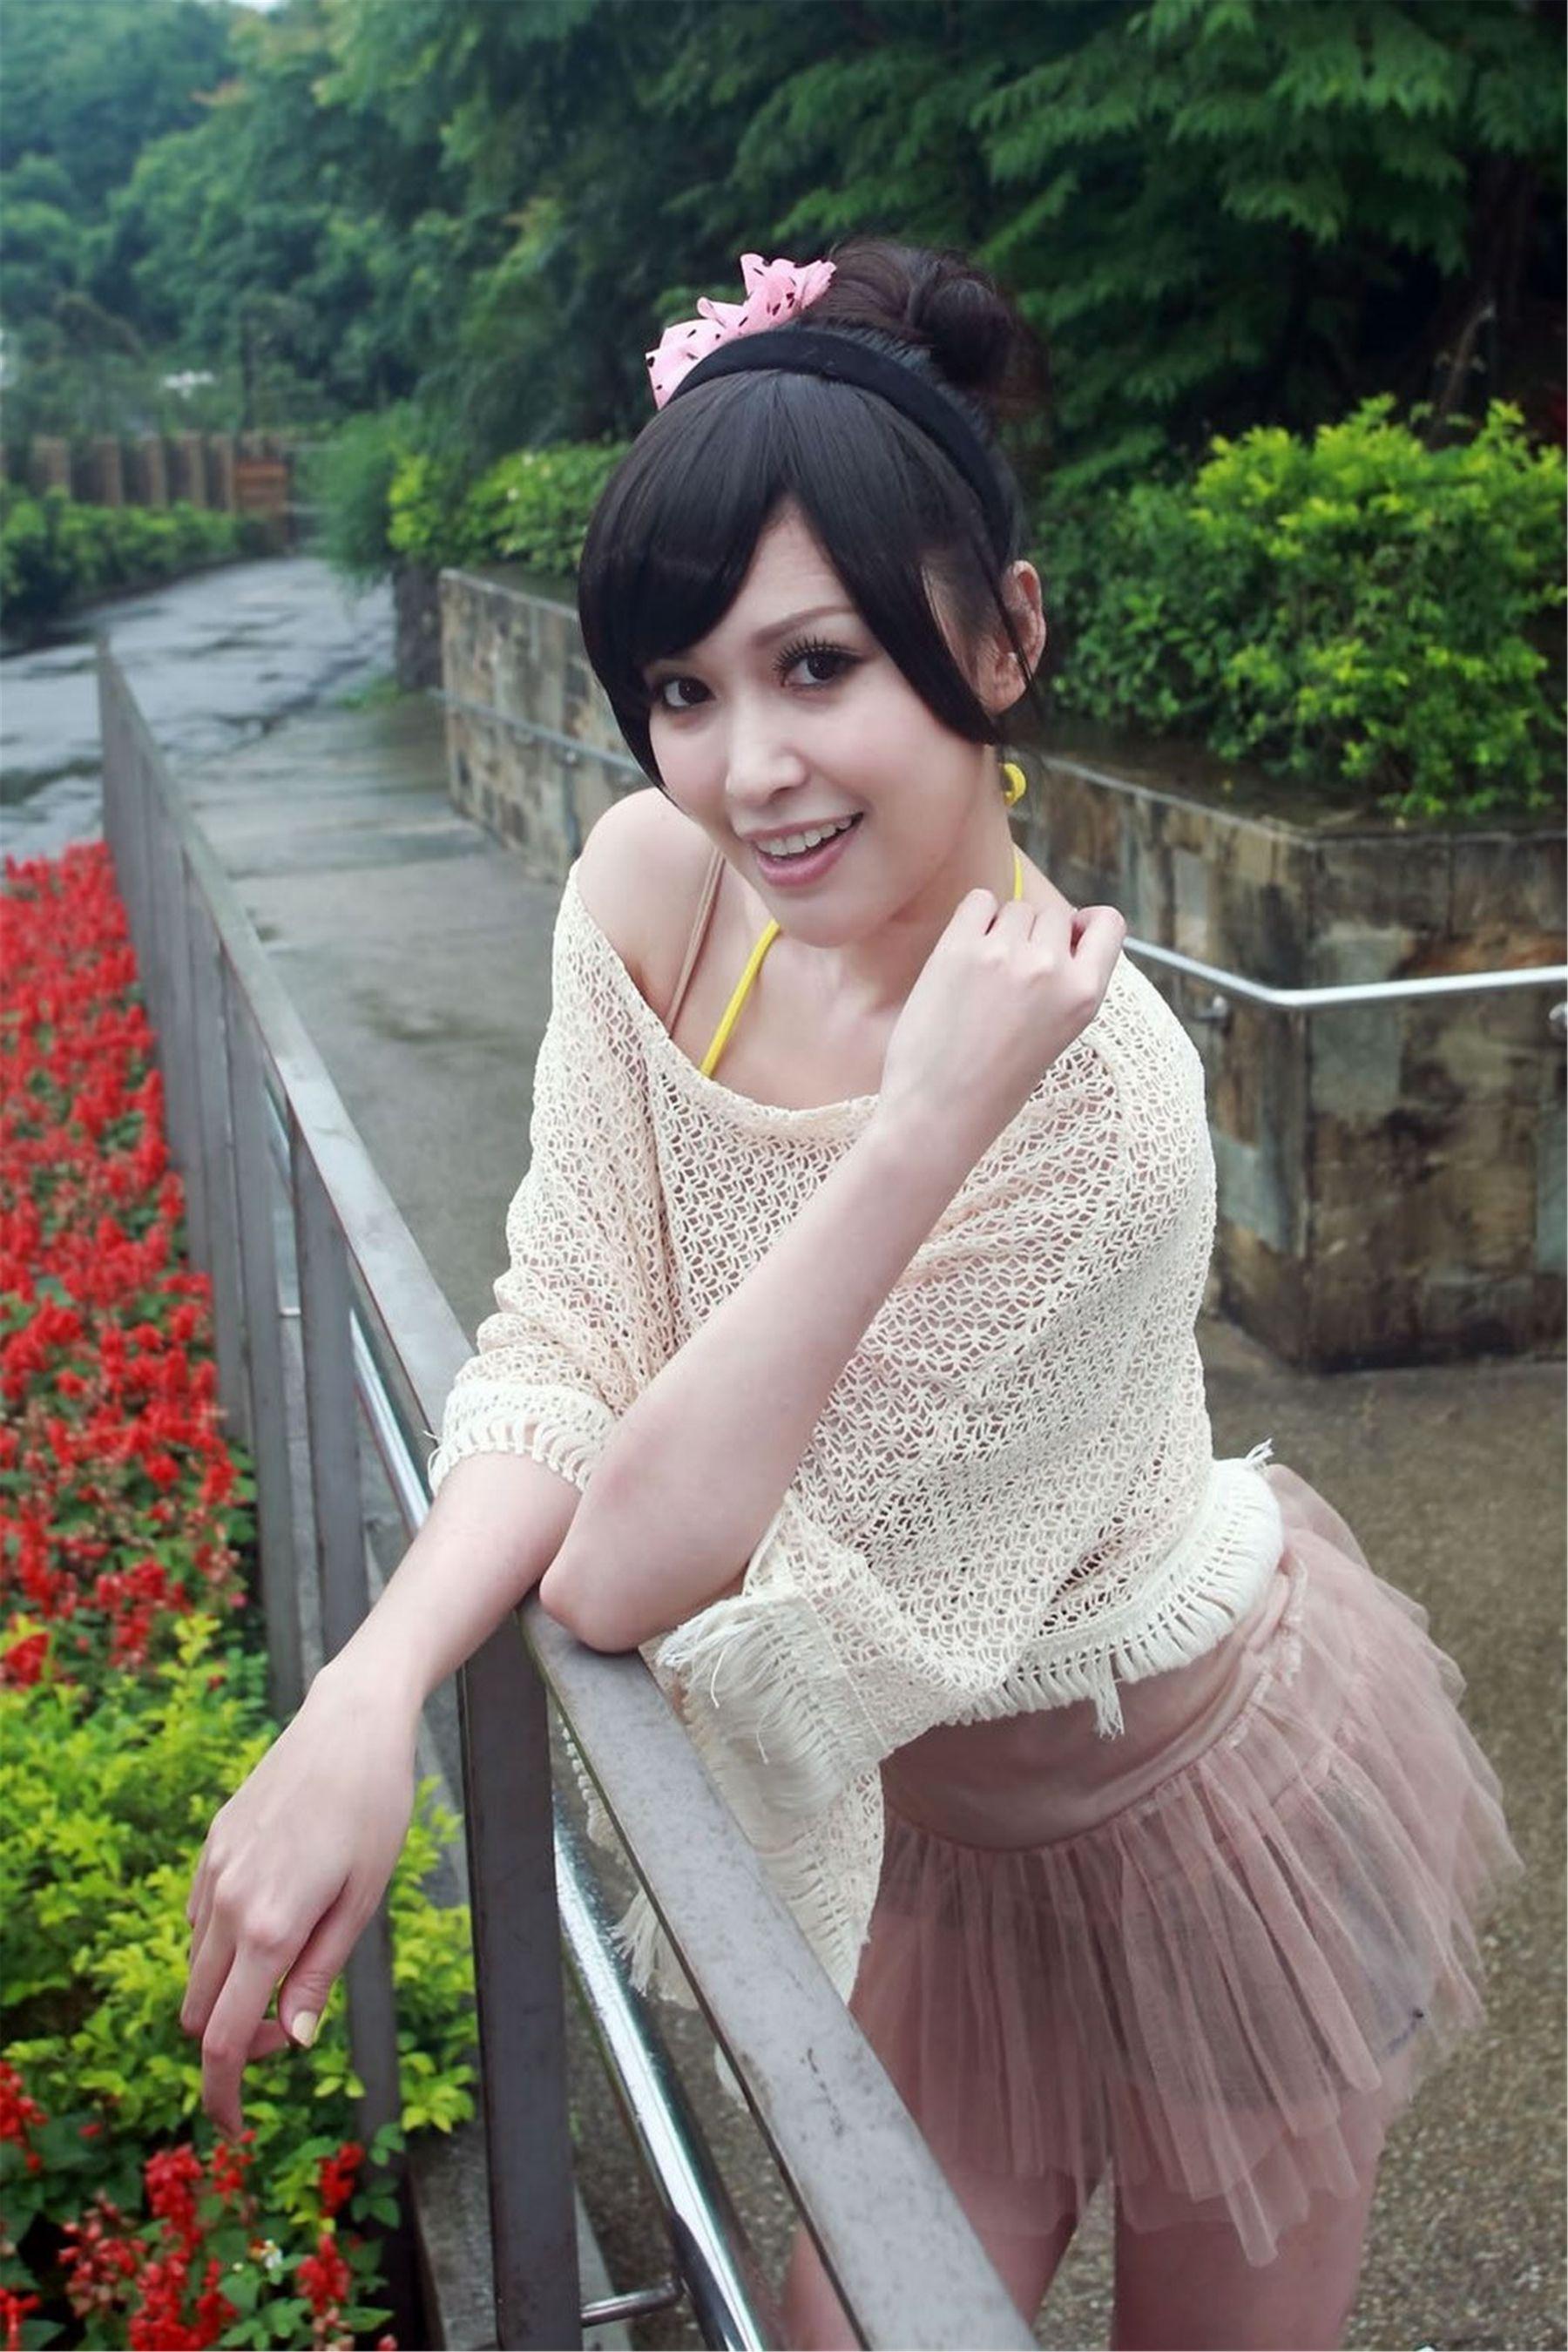 VOL.1553 [台湾正妹]可爱清纯清新外拍:杜可薇(腿模Avy,恬小鱼)超高清个人性感漂亮大图(44P)